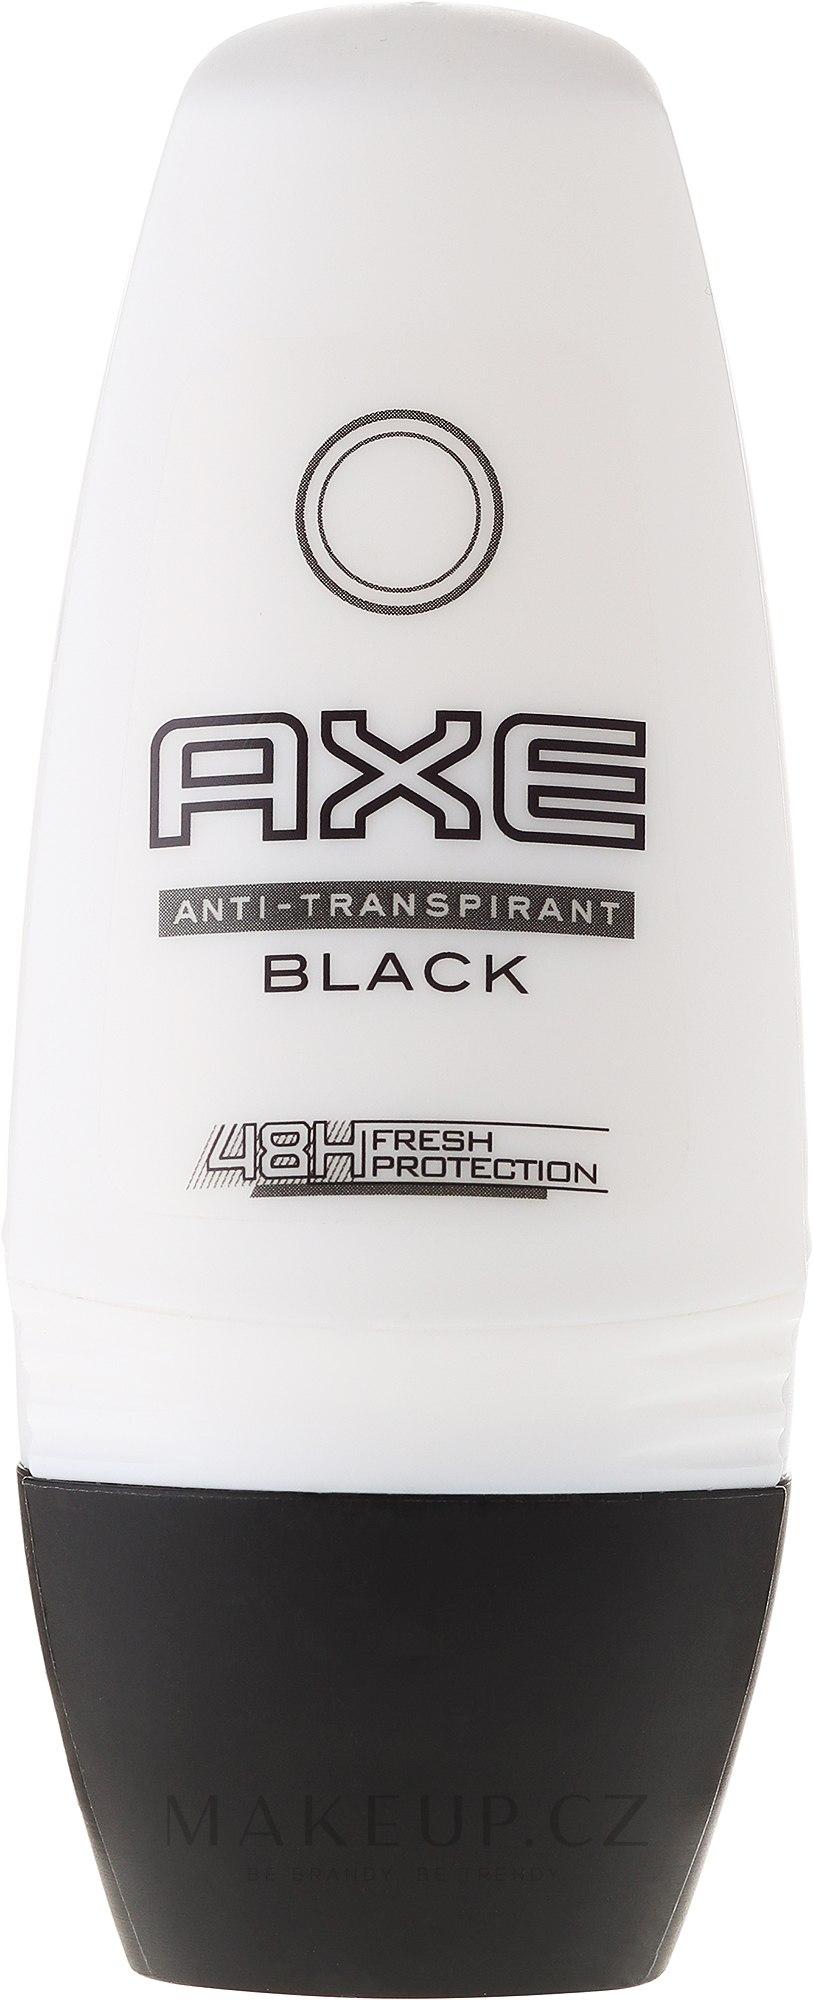 Kuličkový deodorant - Axe Black 48H Anti-perspirant — foto 50 ml